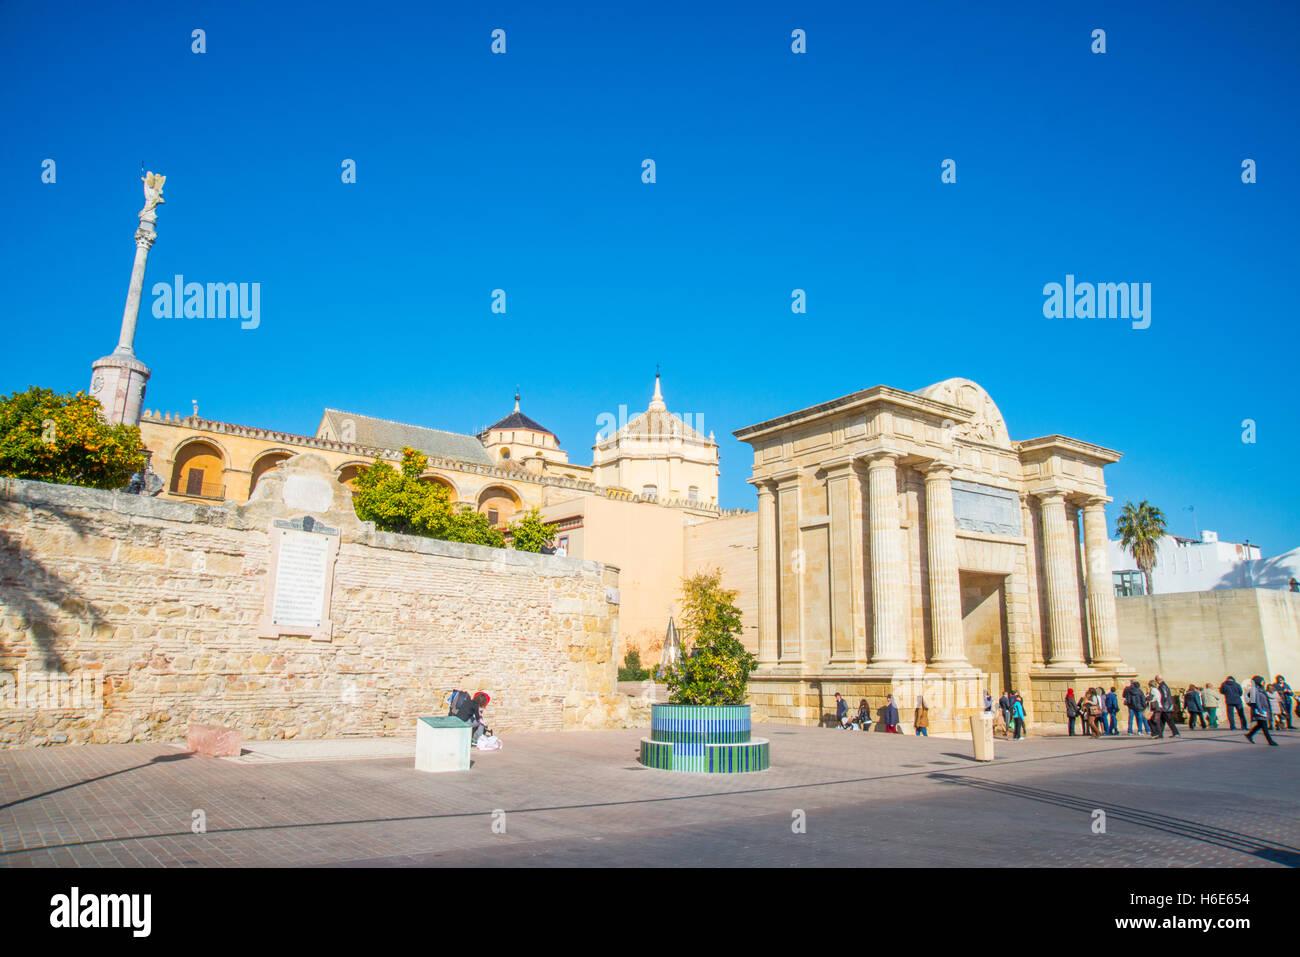 Bridge Gate. Cordoba, Spain. - Stock Image